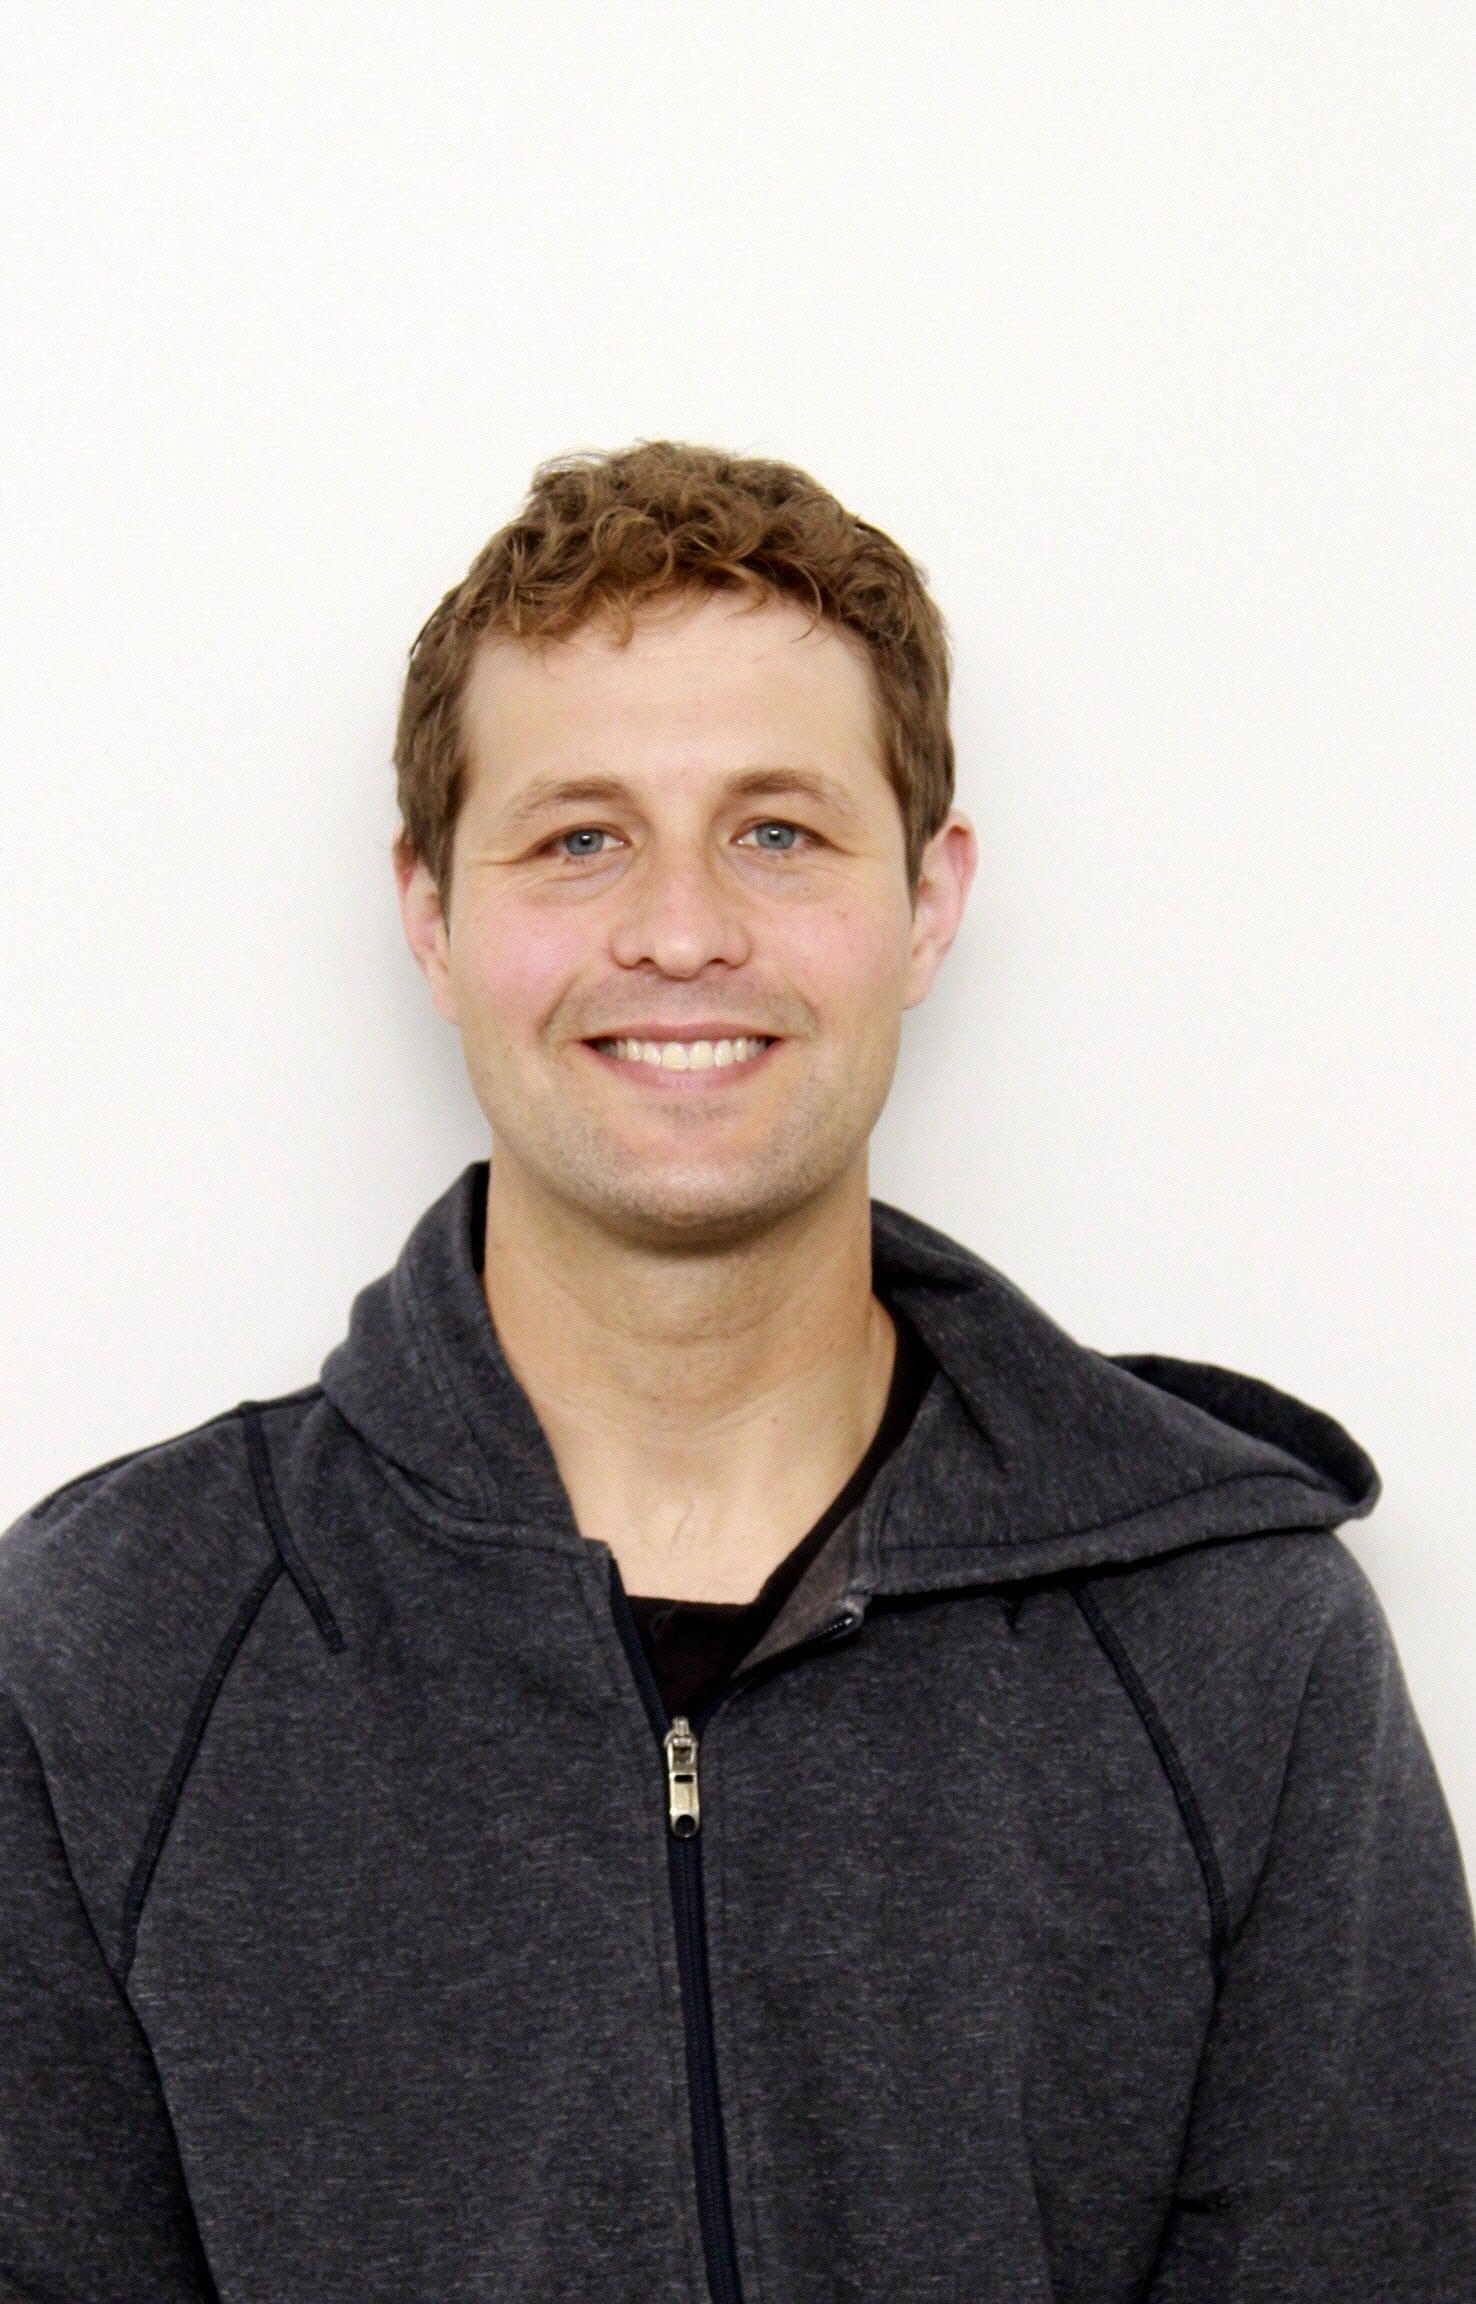 Josh Schwarzapel